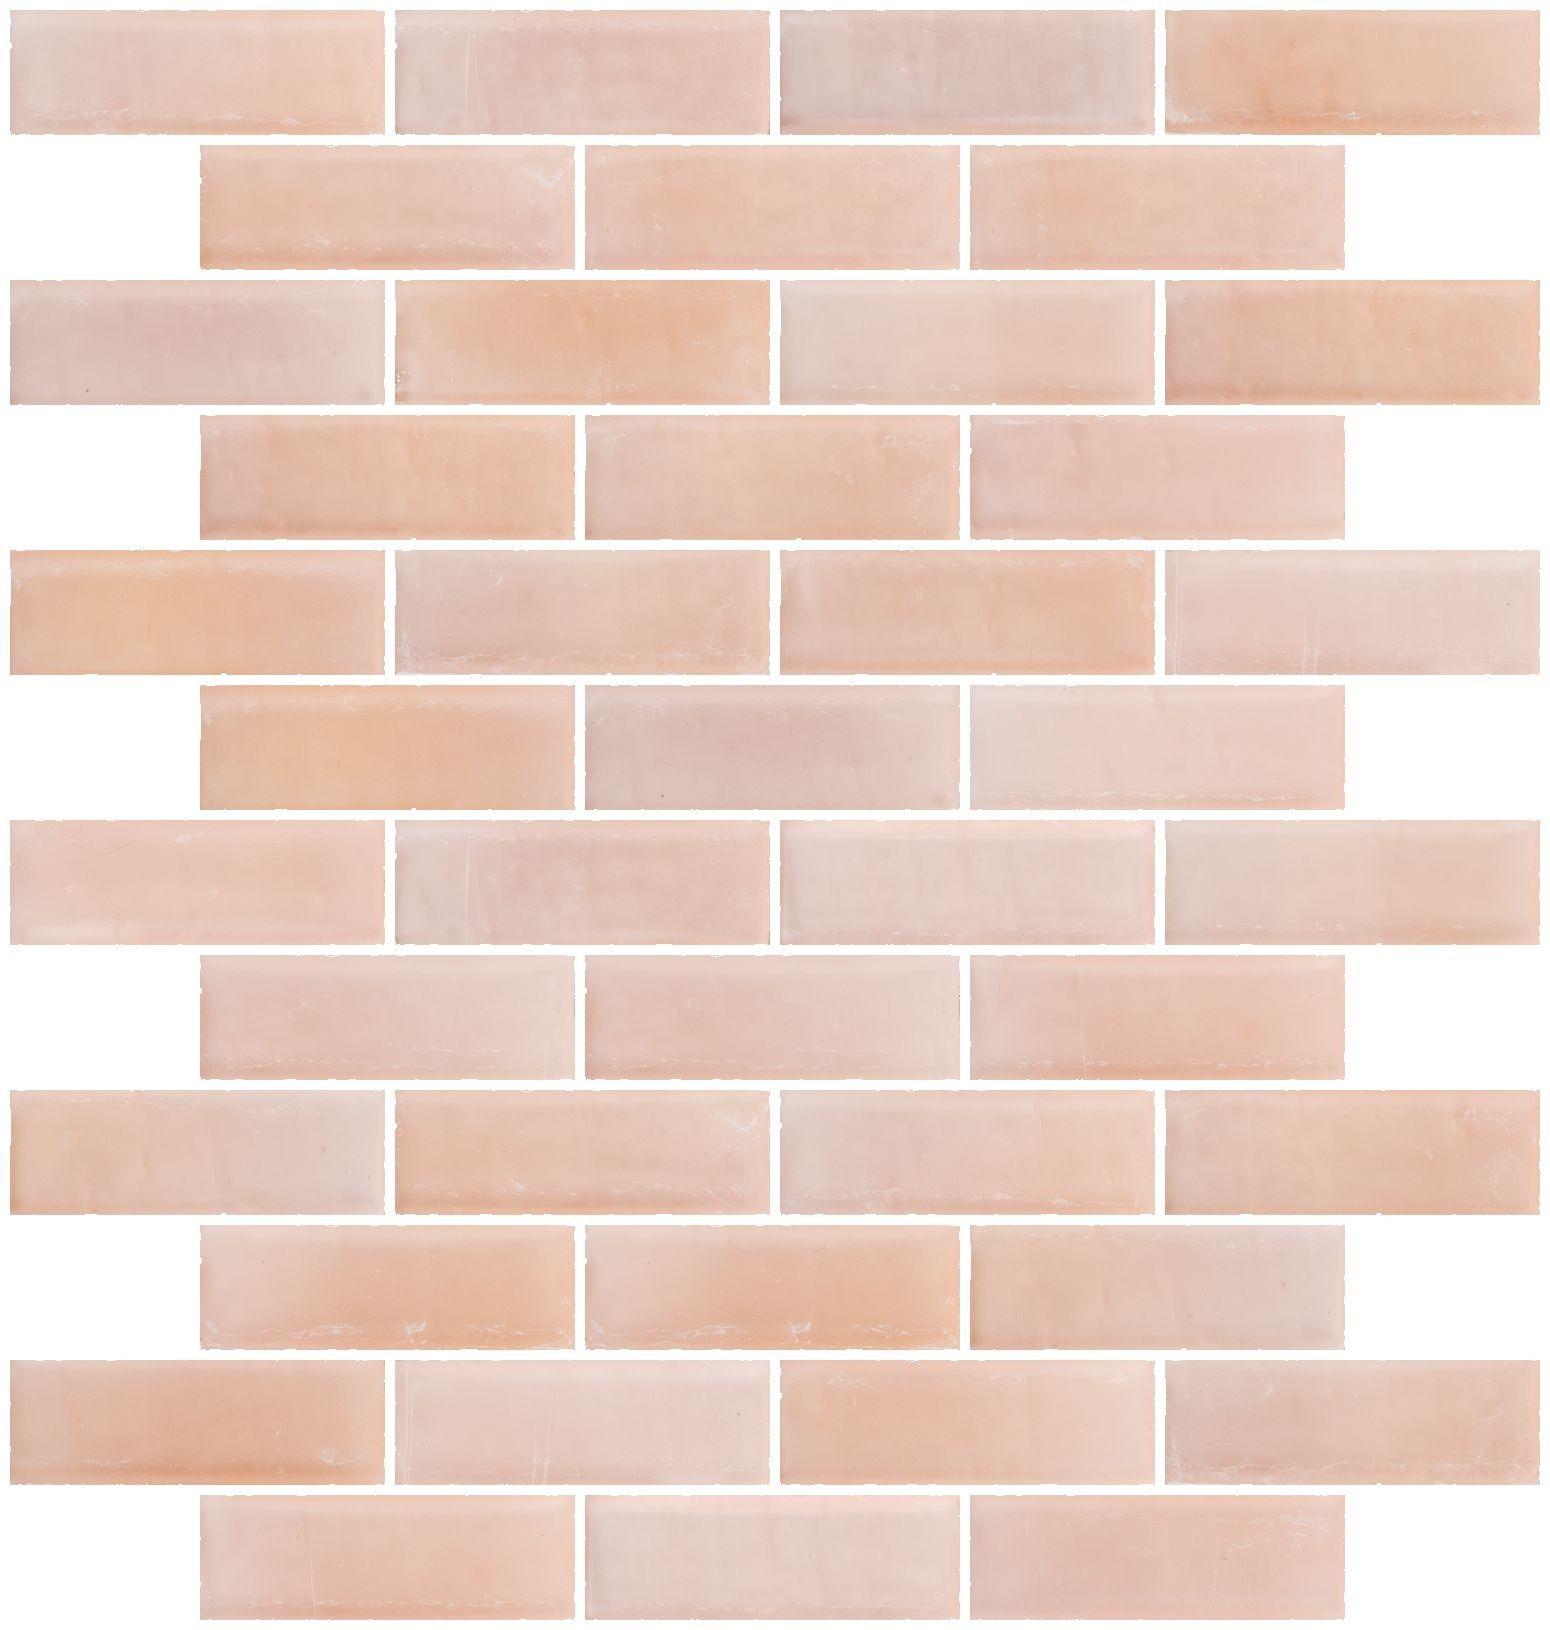 Kitchen Tiles Pink 1x3 inch matte peach pink glass subway tile for backsplash